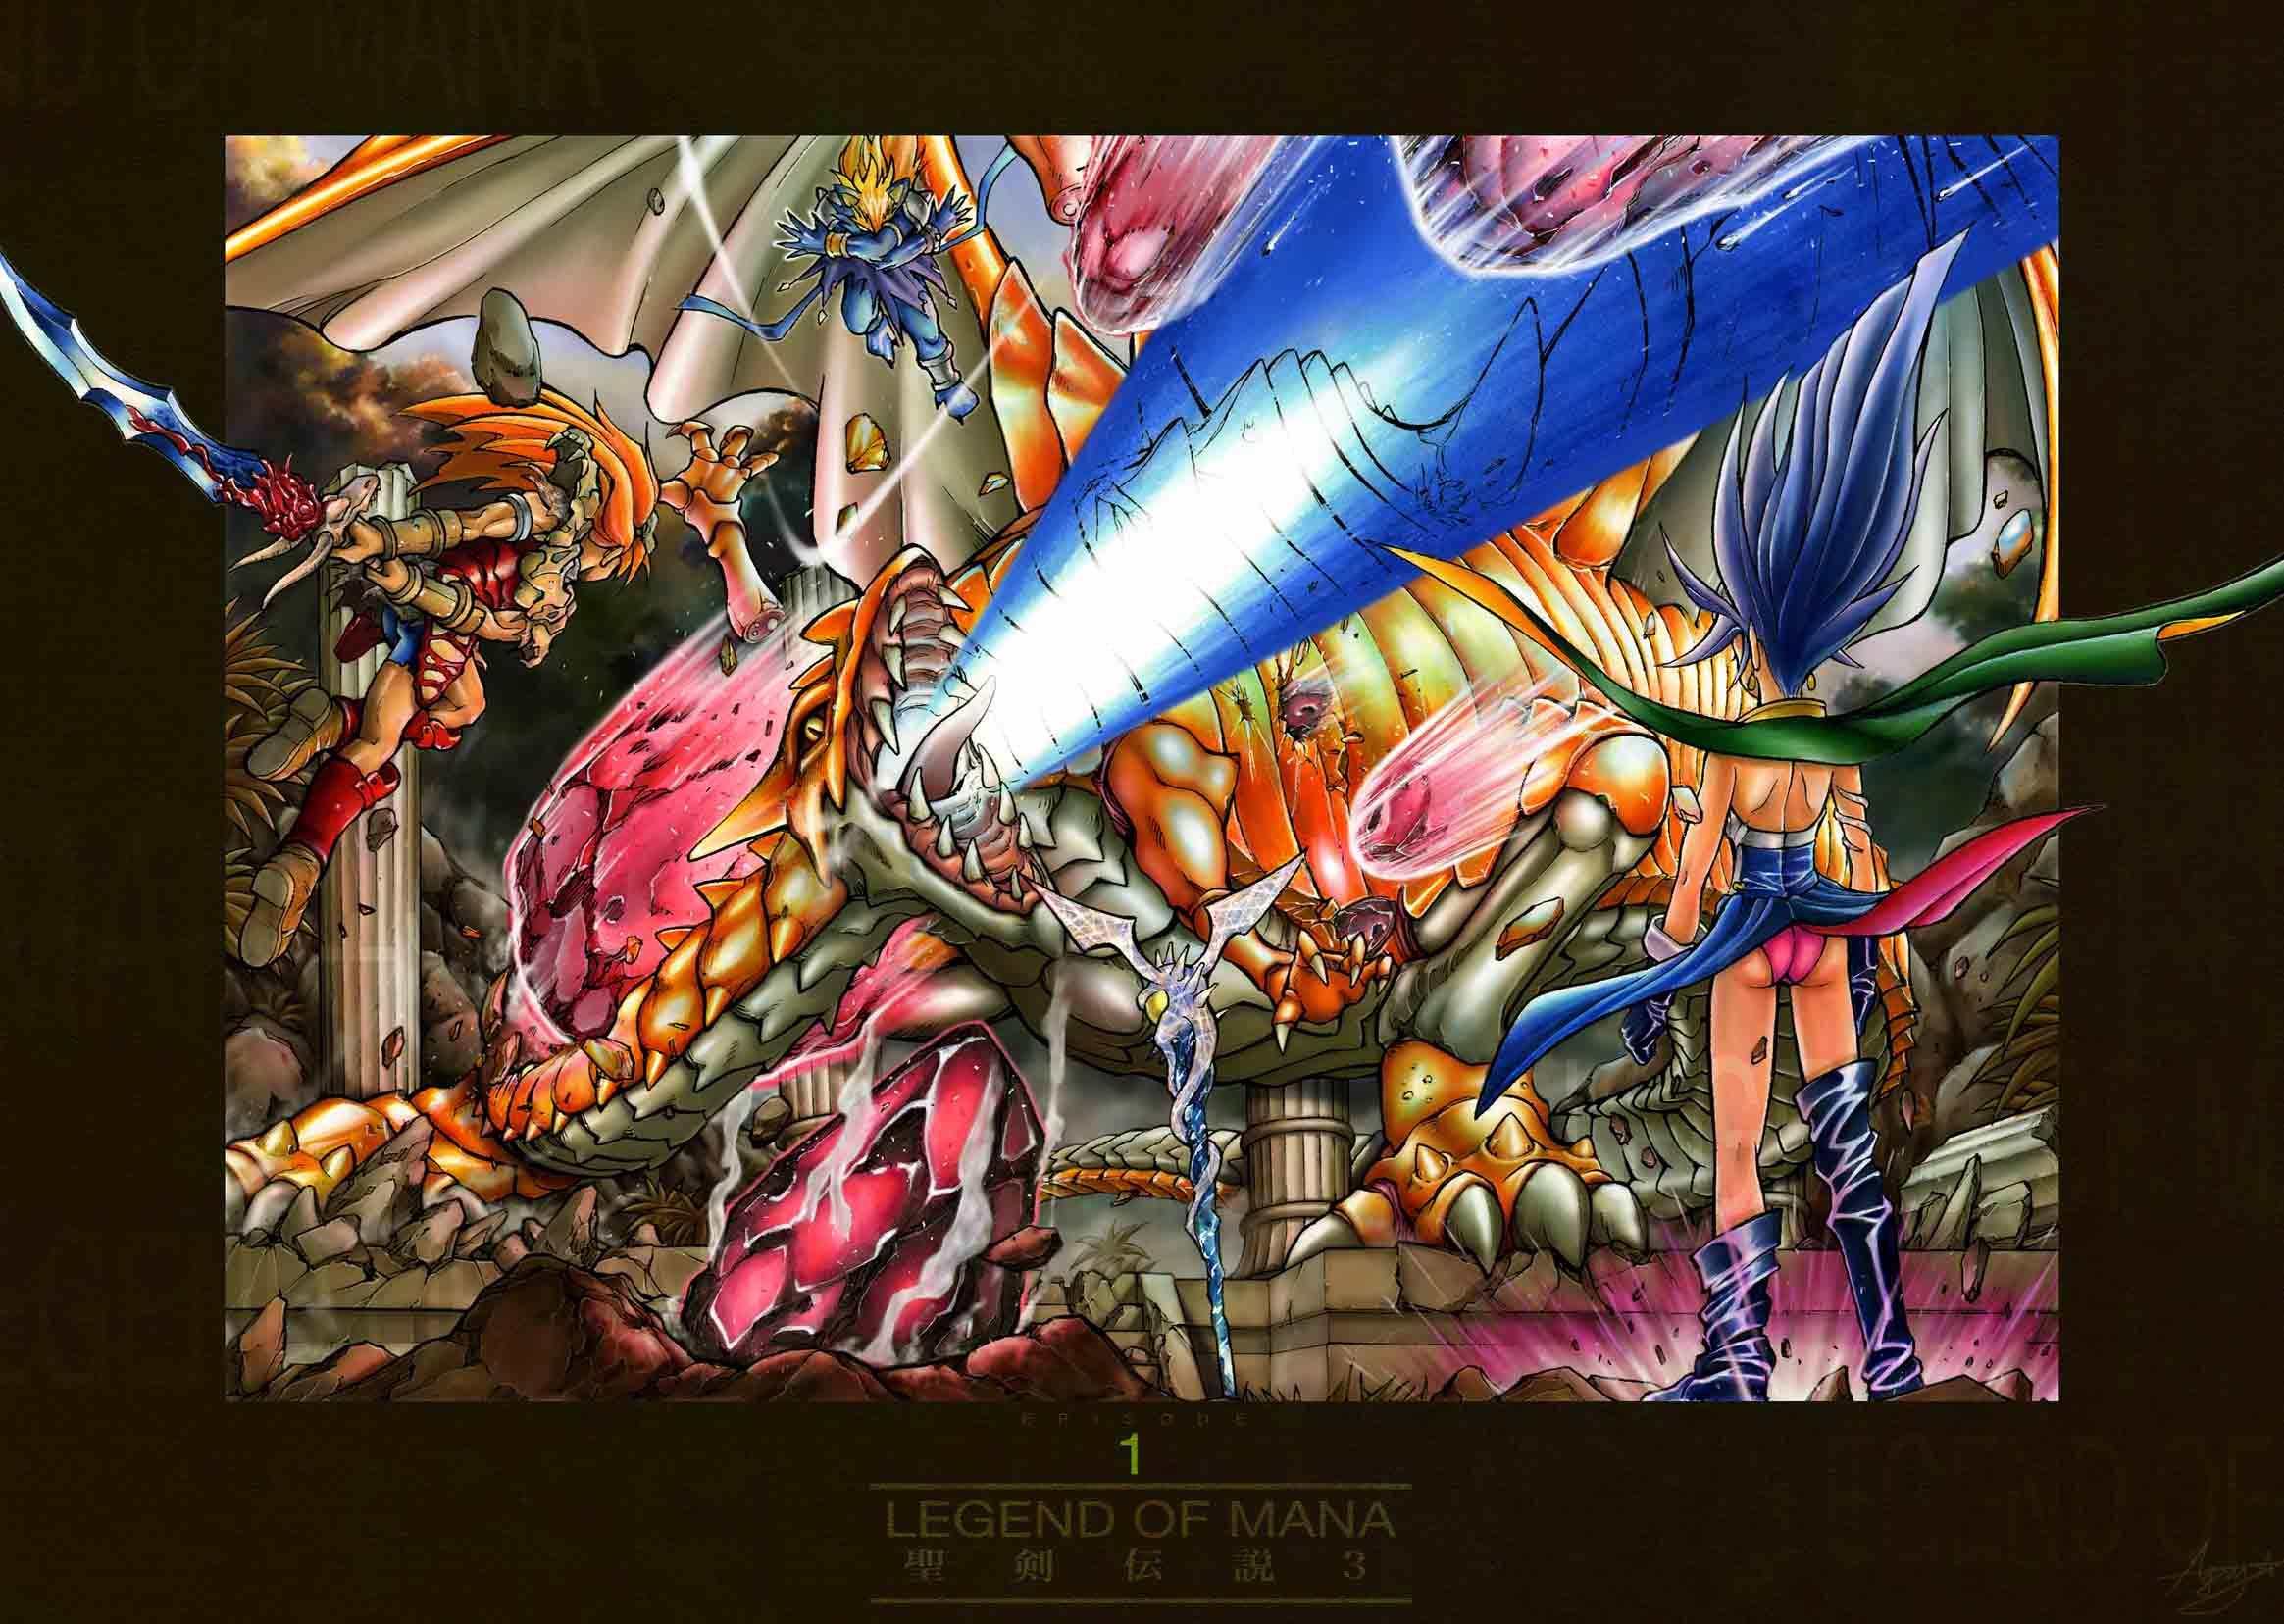 聖剣伝説3の画像 p1_14